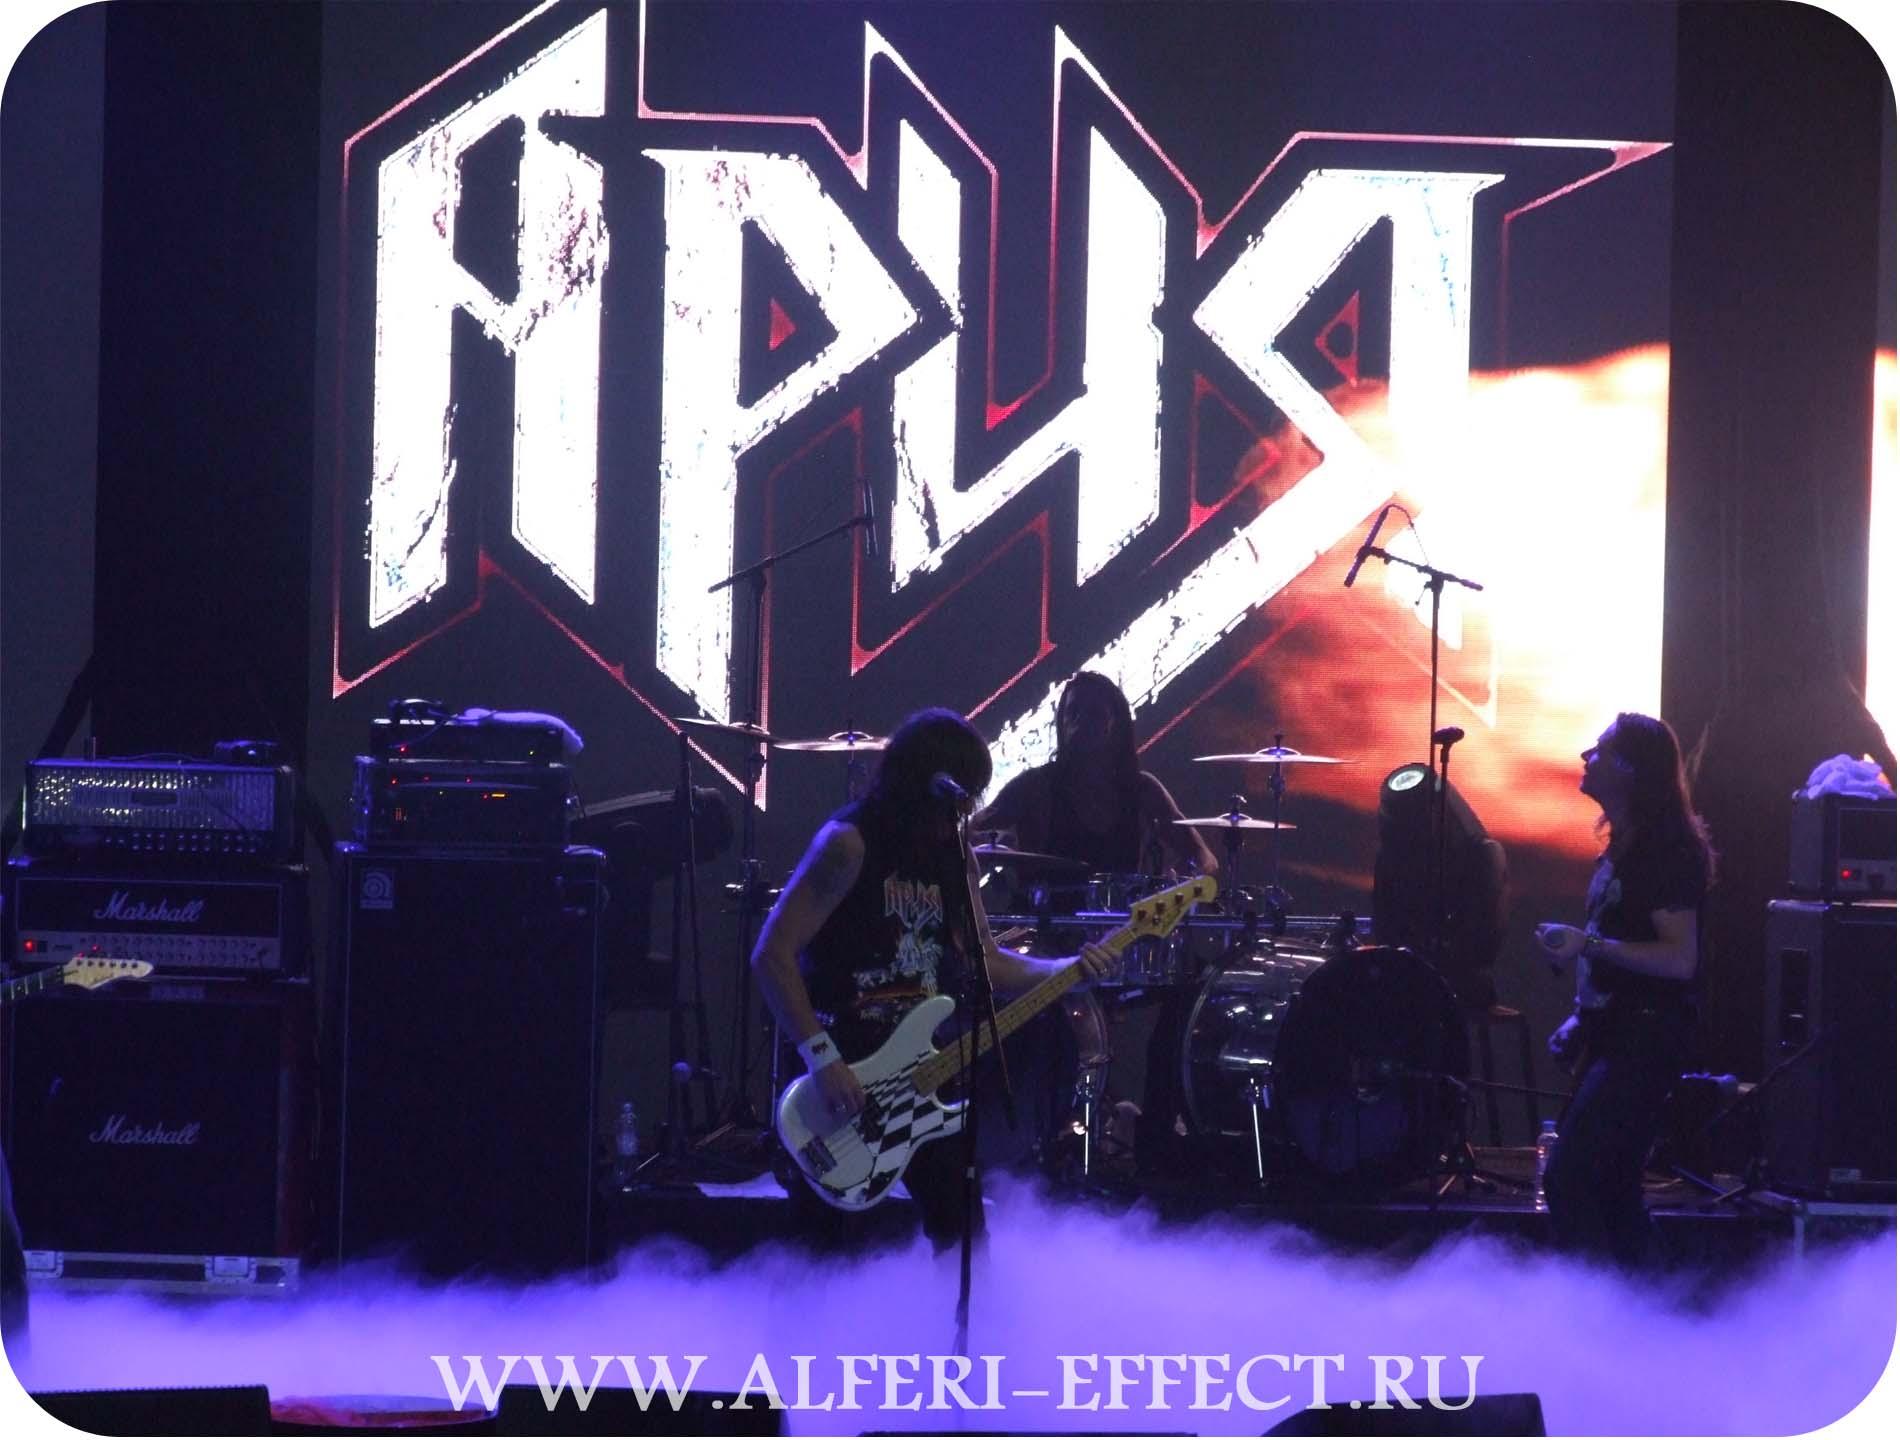 Спецэффекты на концерте группы - Ария / 2014